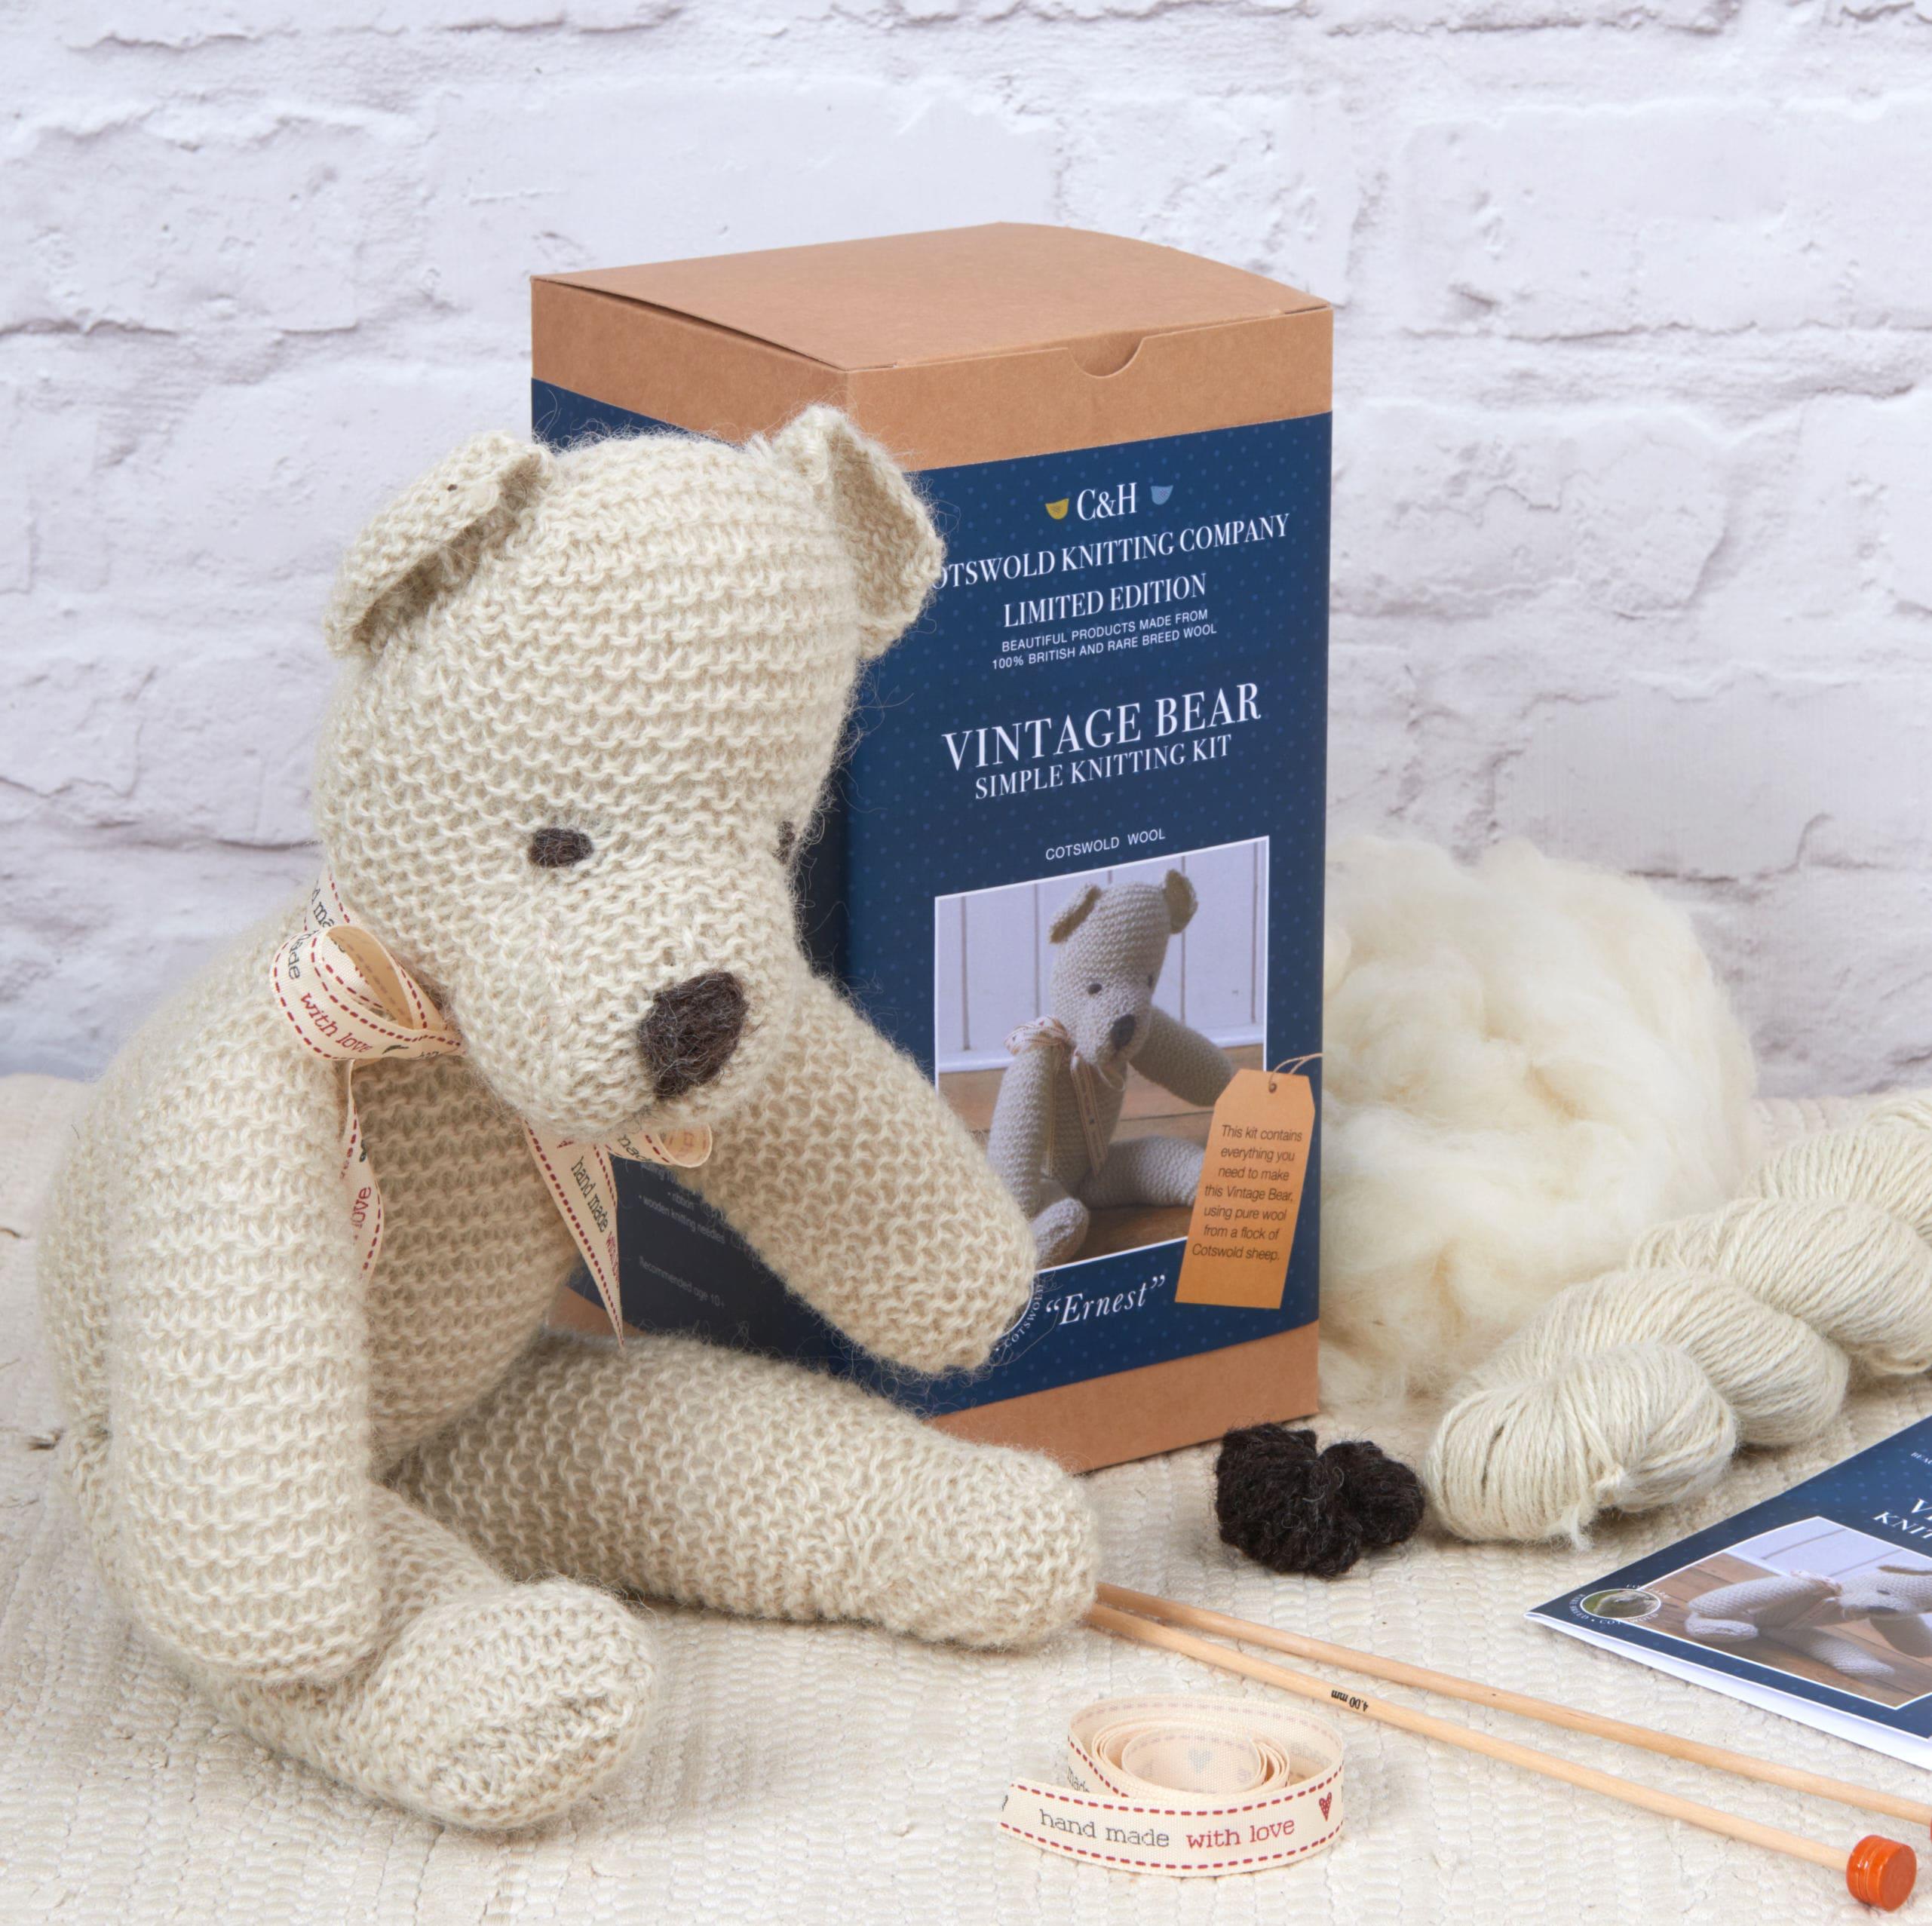 Beginner Knitting Kits Canada : Limited edition vintage teddy bear knitting kit 'ernest